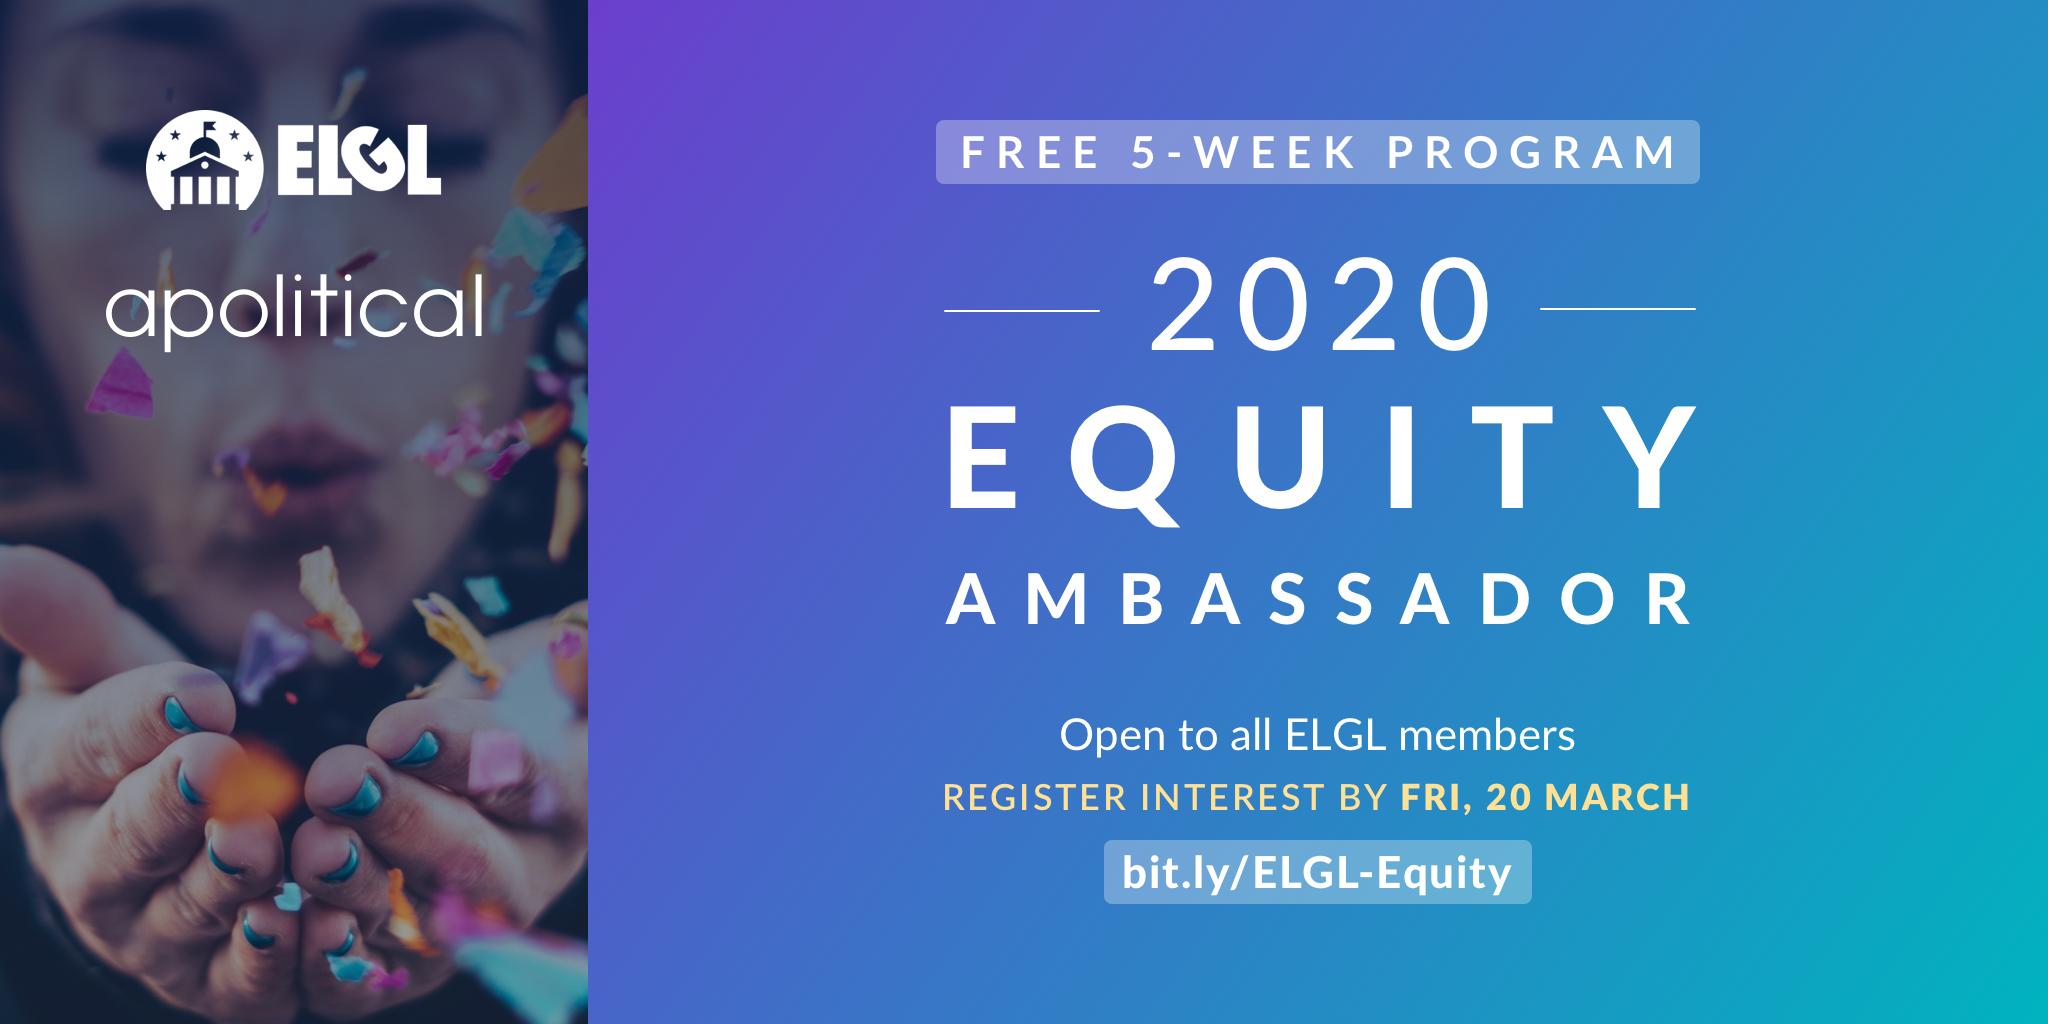 elgl-apolitical equity ambassadors program